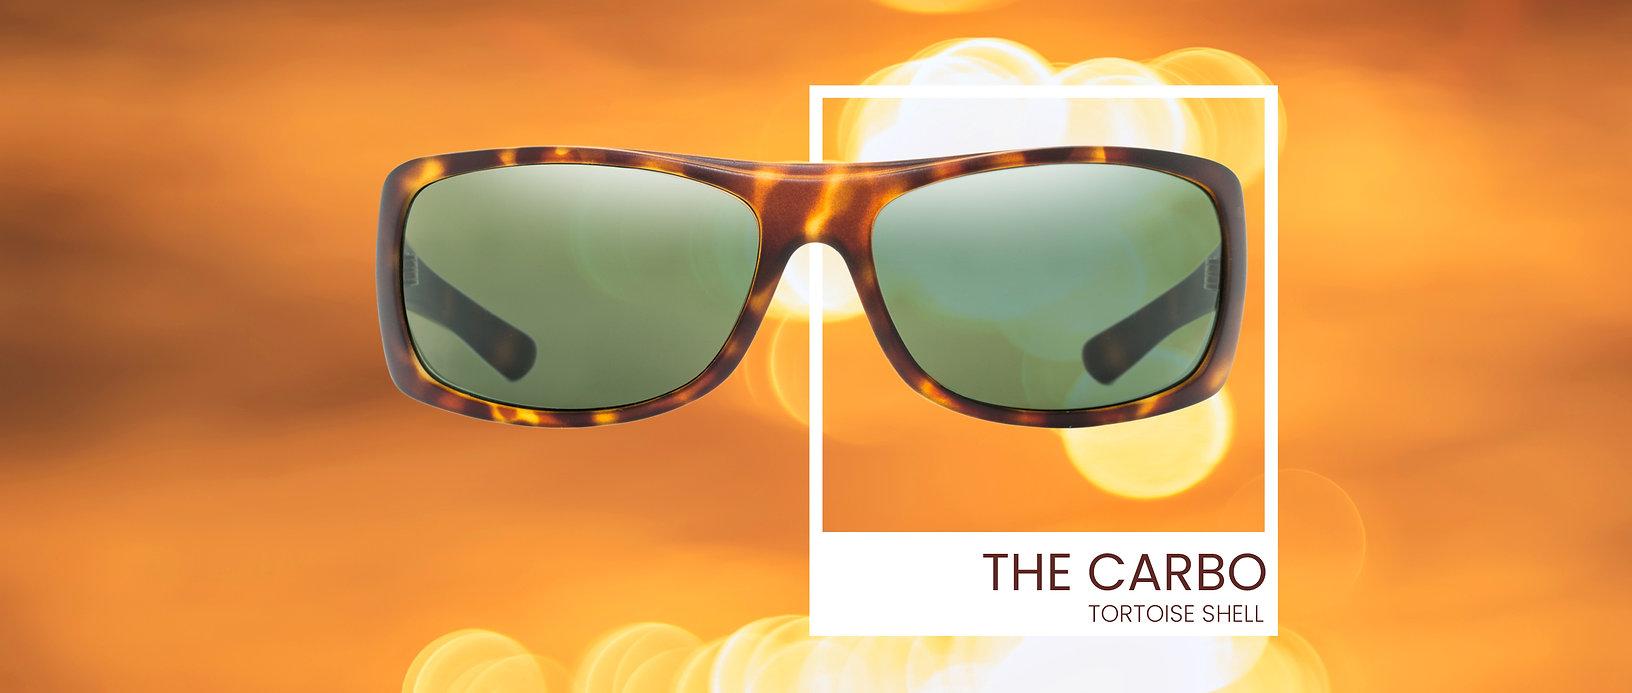 us-eyewear-product-banner_carbo.jpg